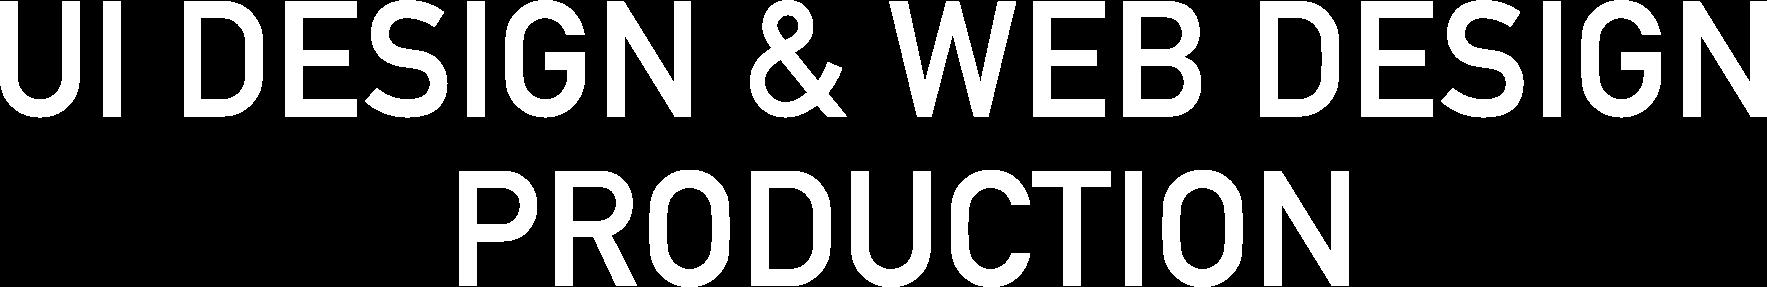 UI/UX DESIGN & WEB DESIGN PRODUCTION